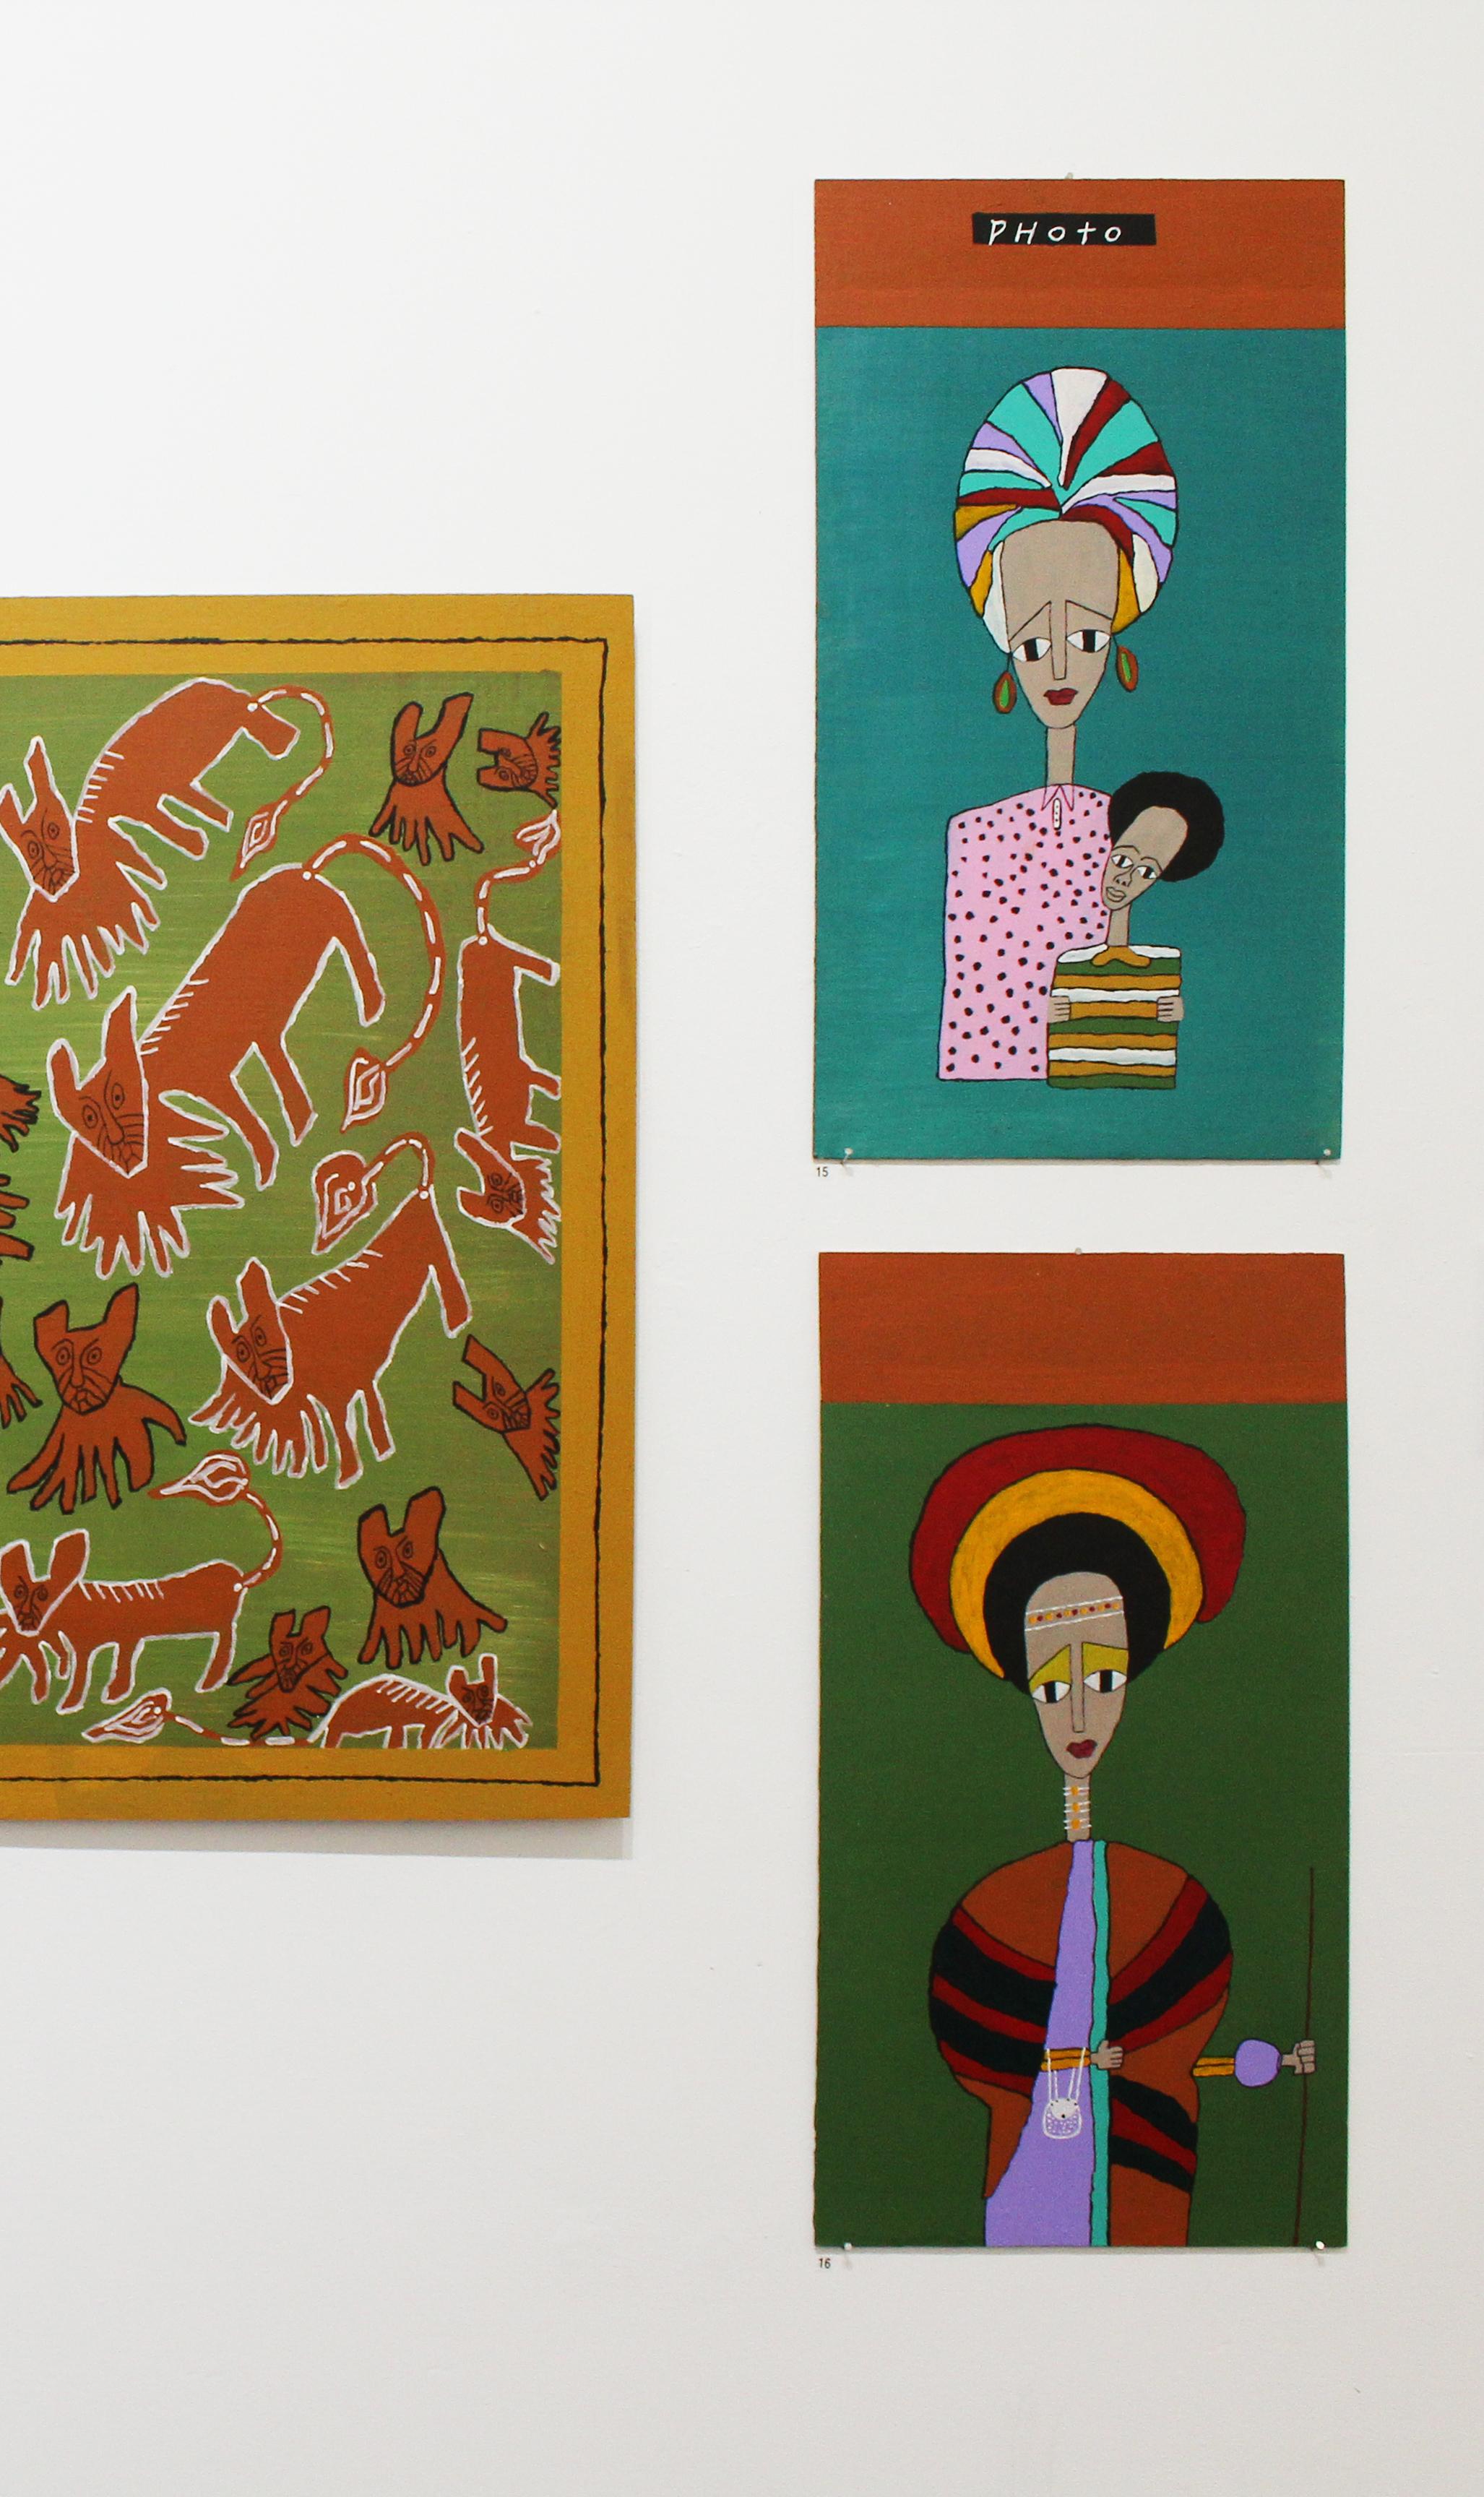 'Modern Mum', Olana Janfa, acrylic on recycled timber, 66x36cm $490,  'Oromo Woman', Olana Janfa, acrylic on recycled timber, 66x36cm $490